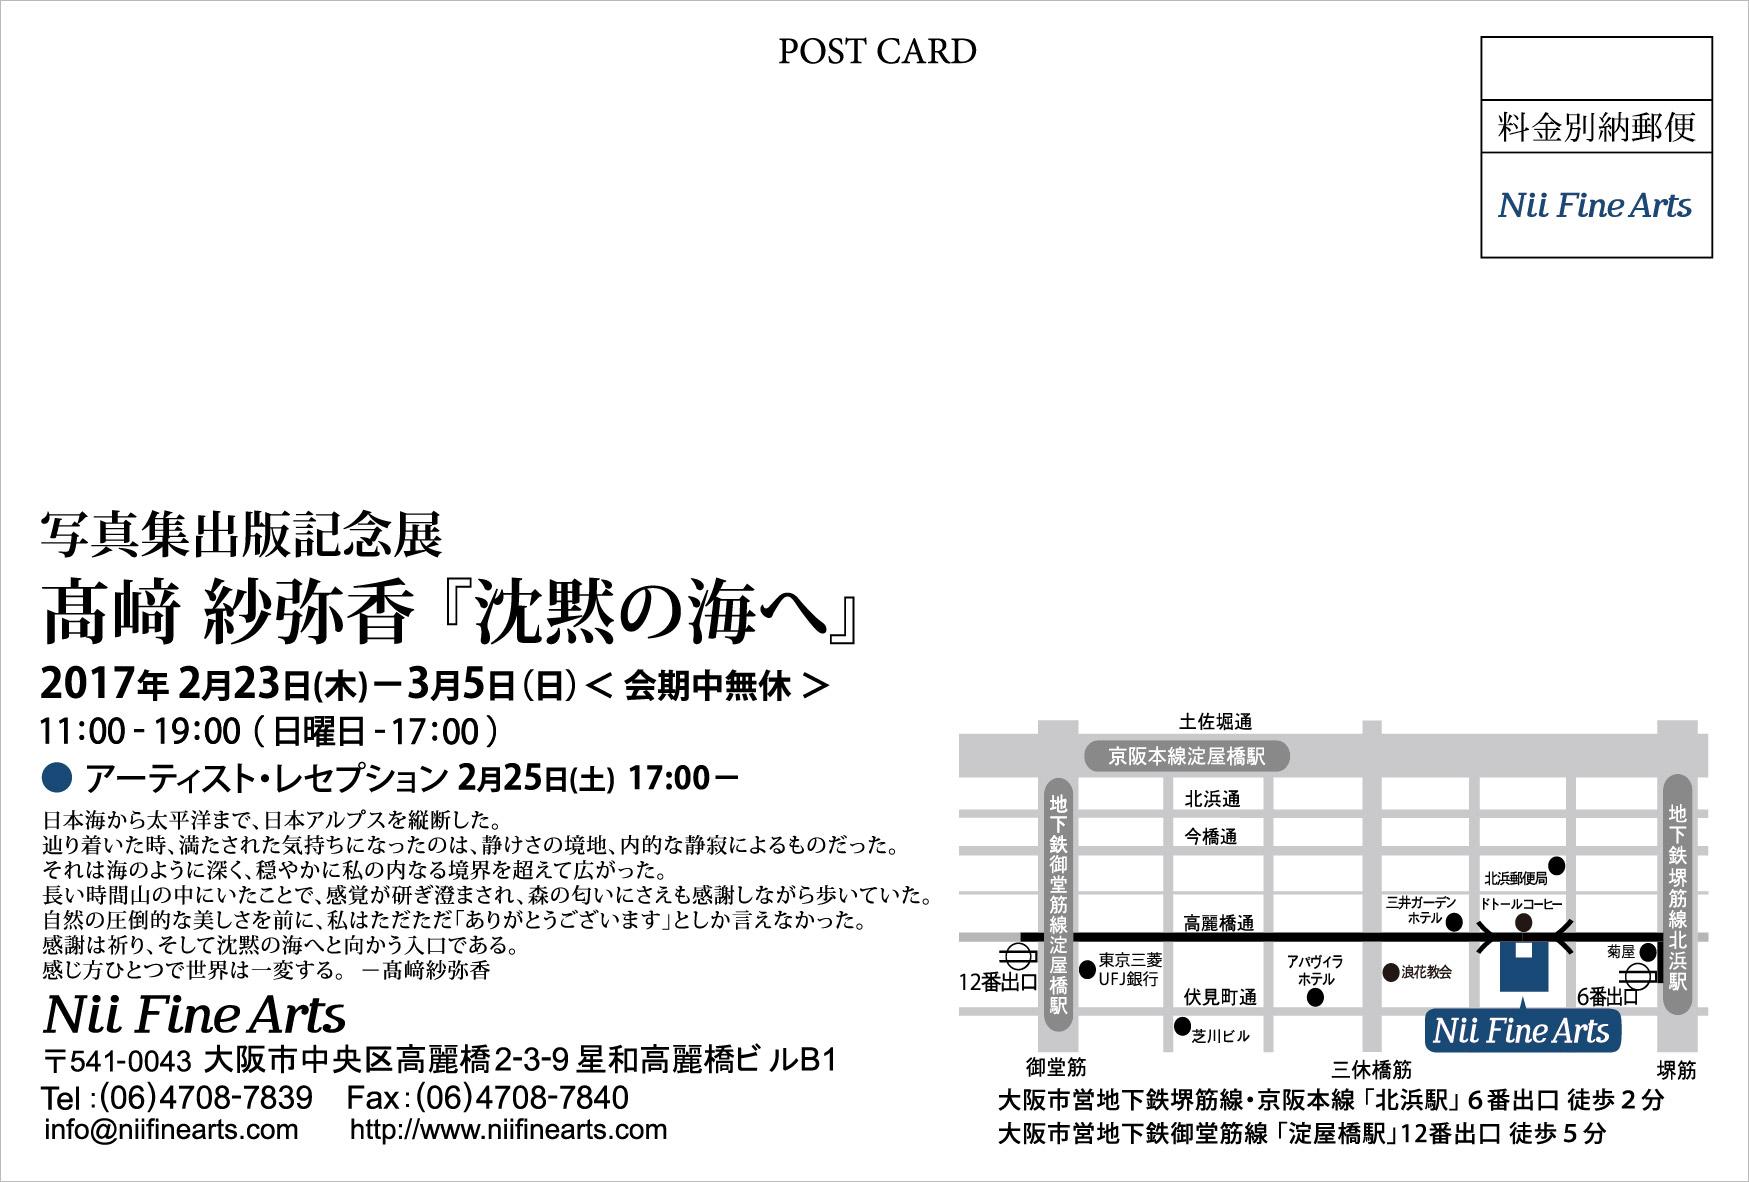 NFA_takasaki_DM_omotejpg